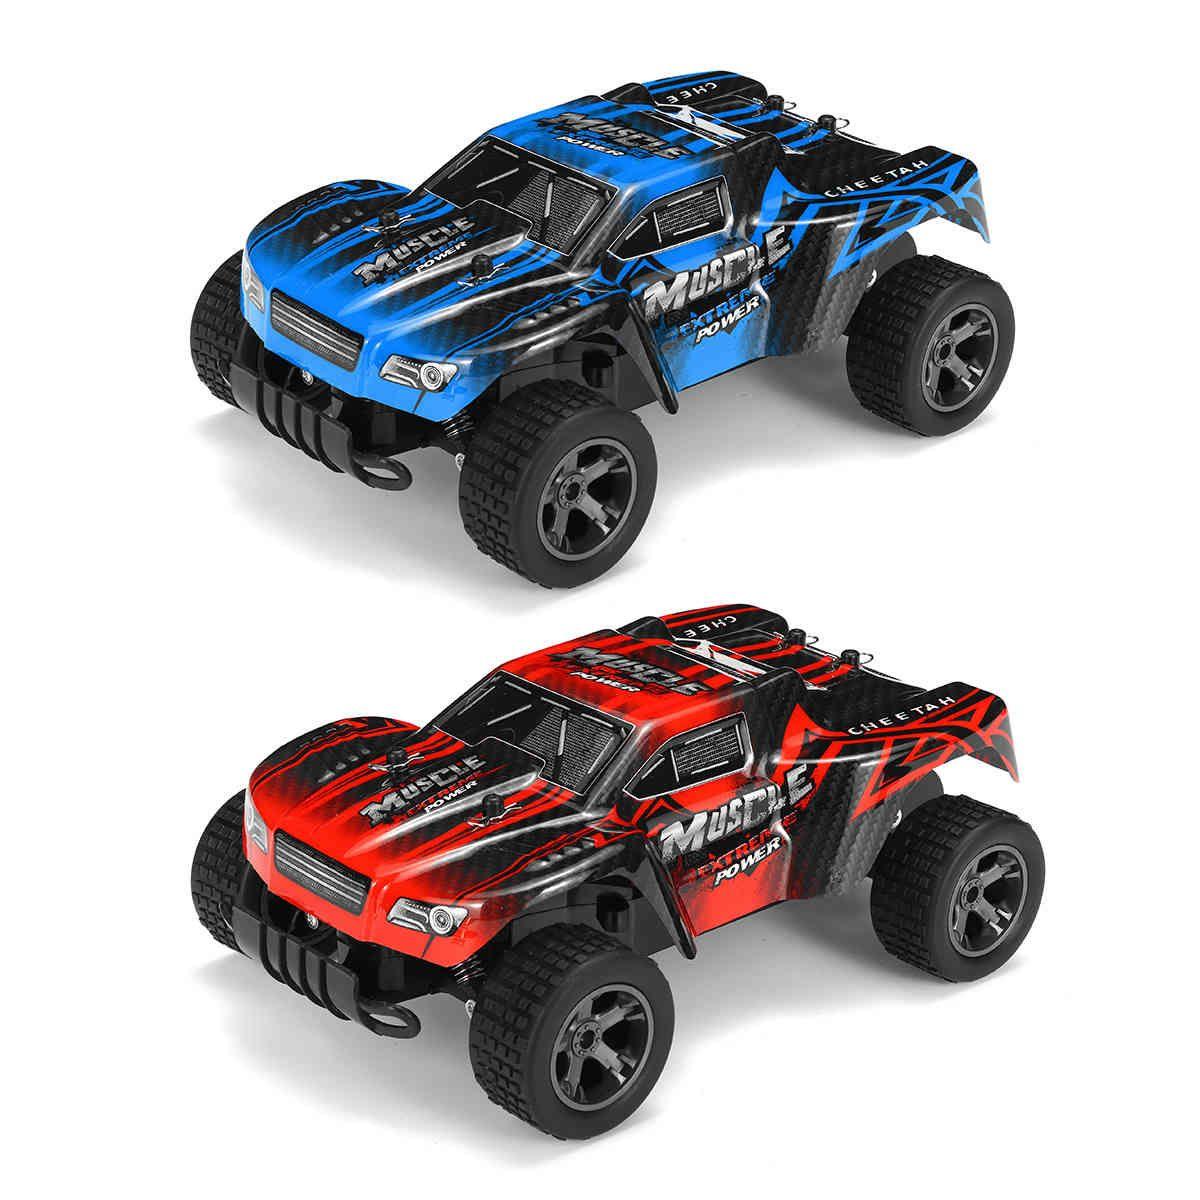 RC Cars Radio Control 1:20 2.4G rock car Buggy Off-Road Trucks Toys For Children High Speed Climbing Mini Rc Drift driving Car 210322